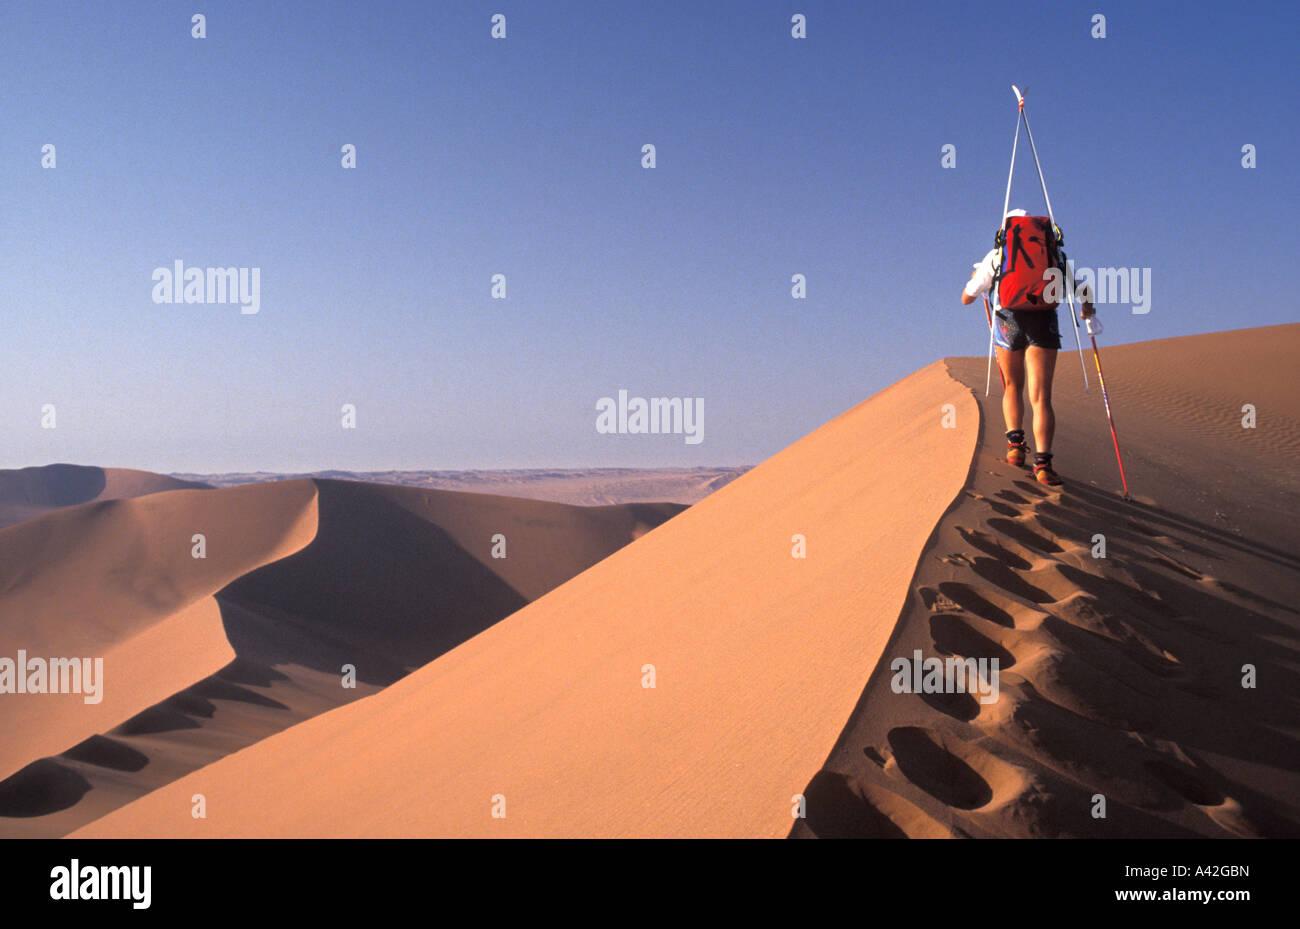 Telemark skier Vaila Macdonald ascending Deadpan Dune Namibia Africa - Stock Image